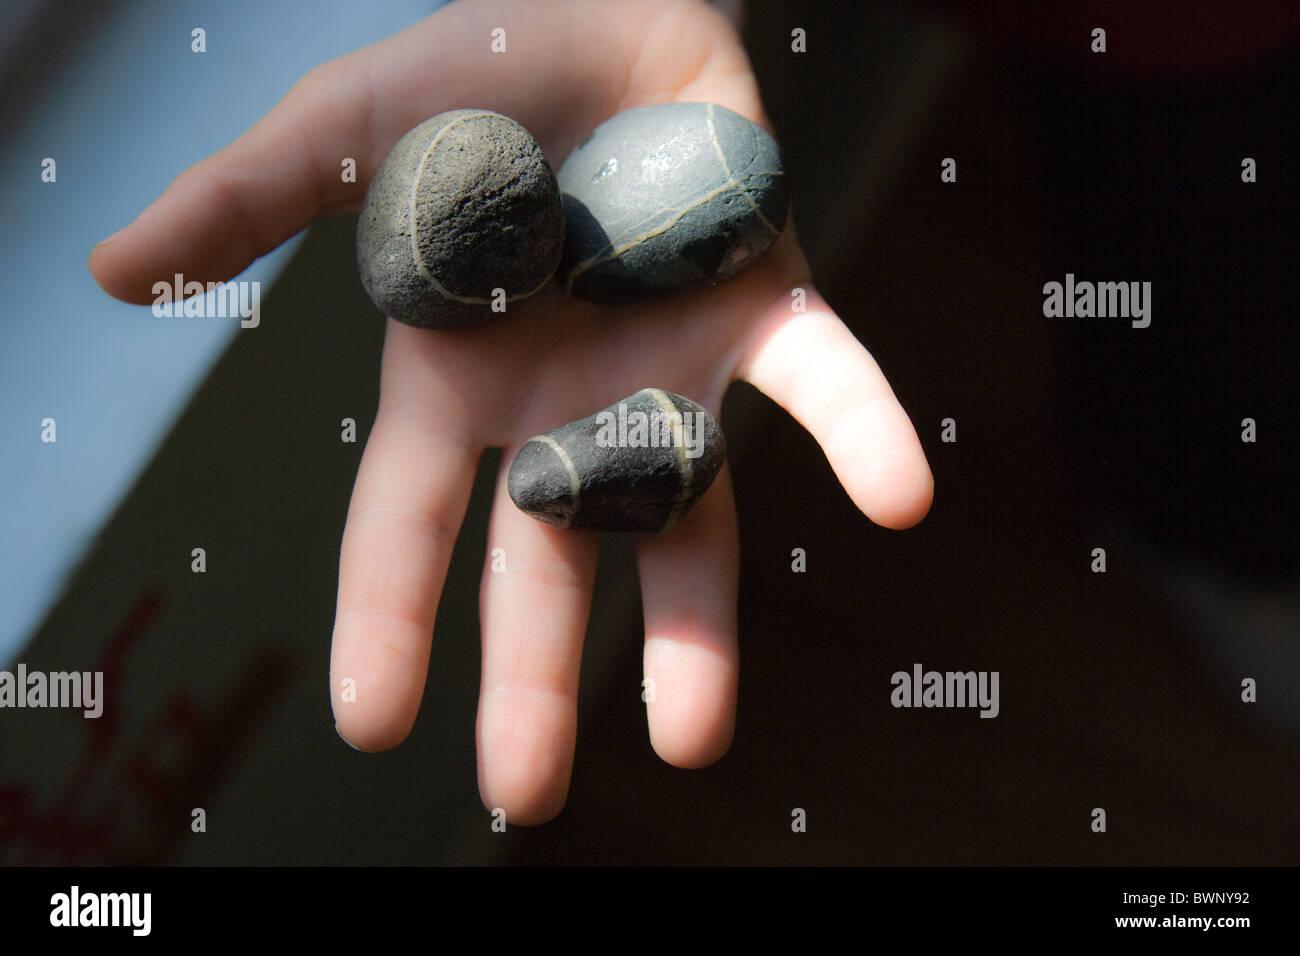 child's hand holding three striped river rocks - Stock Image